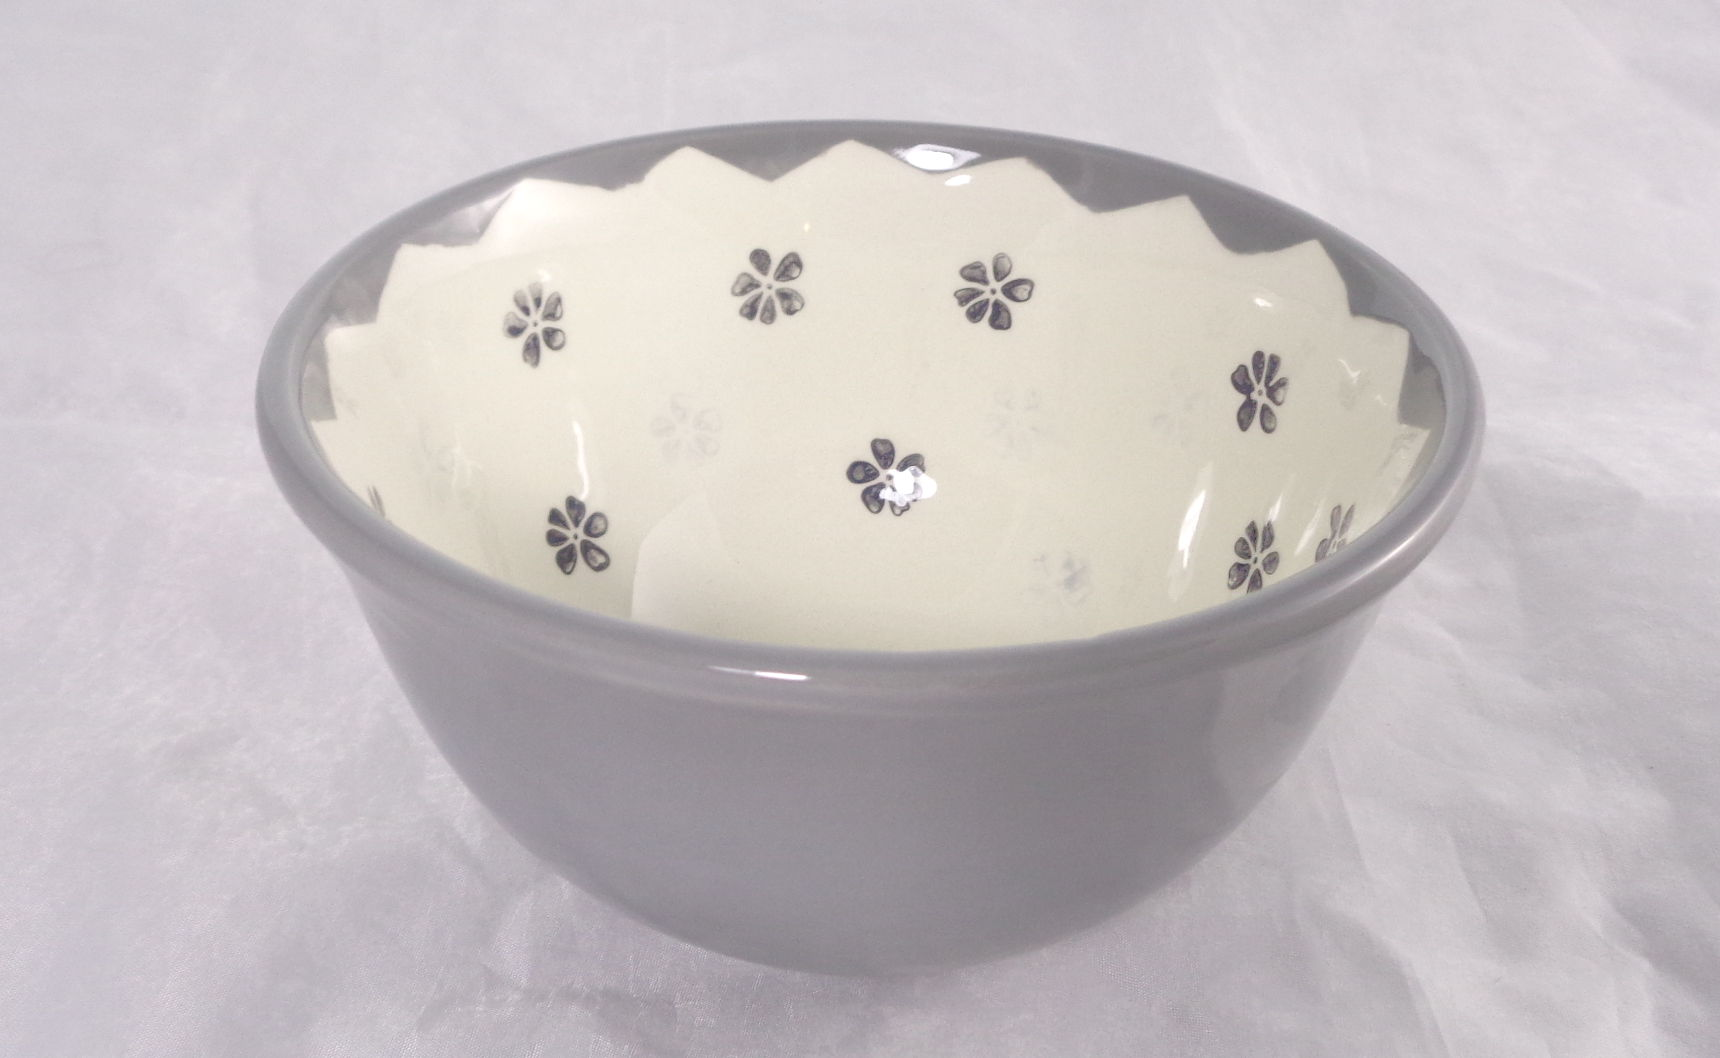 Bemalte Keramik Vintage grau Stemps No2